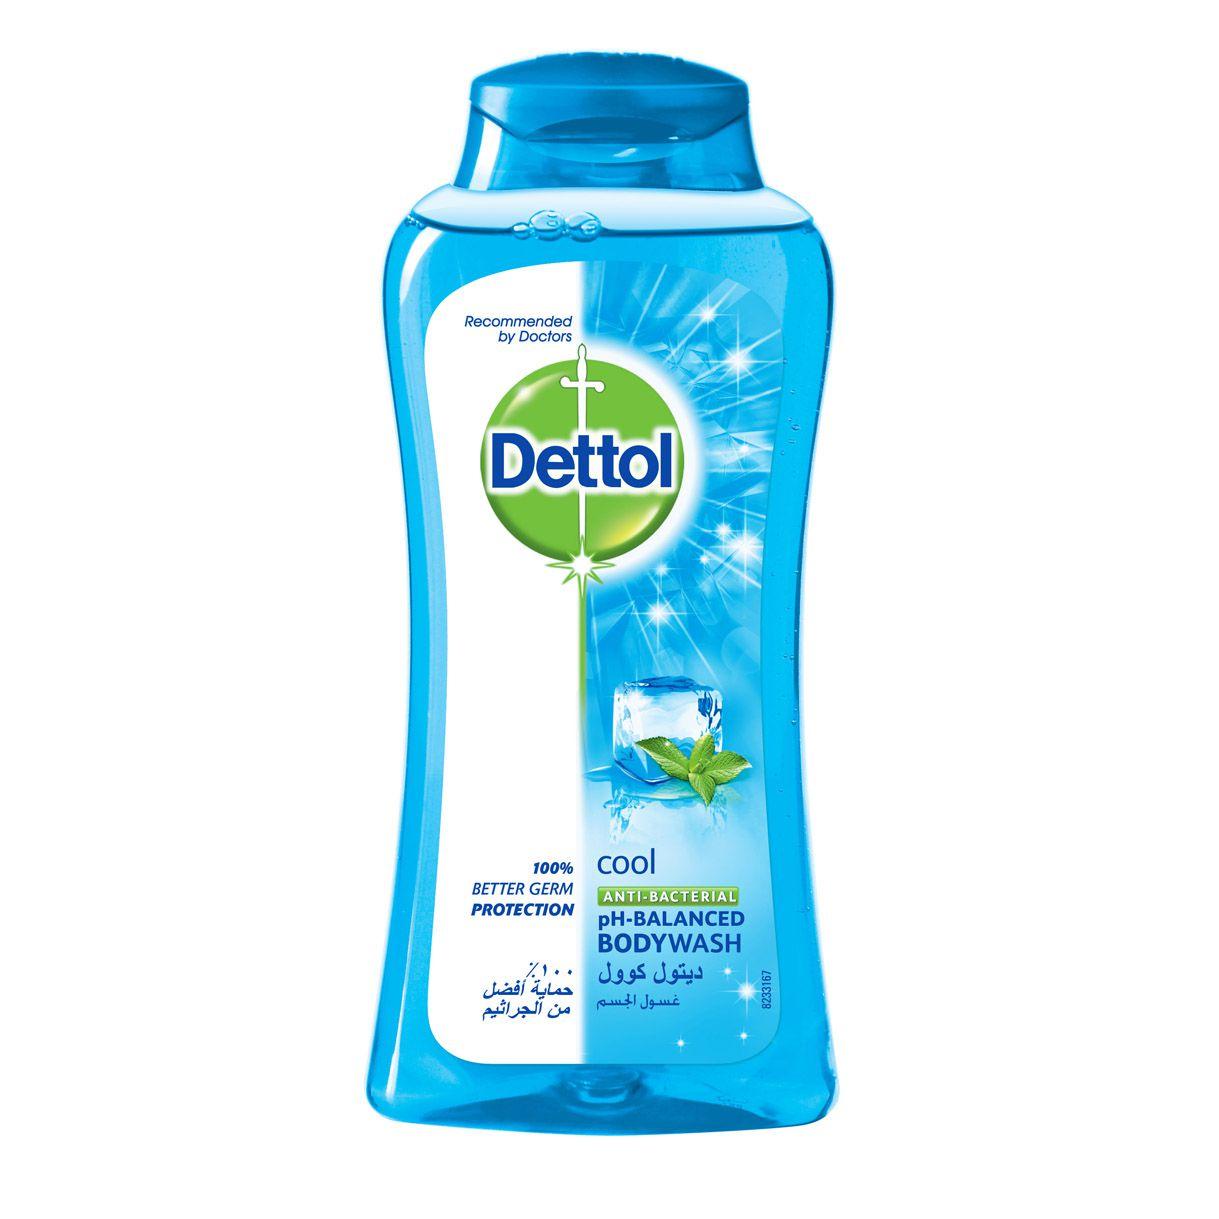 Dettol Cool Bath Soap Shower Gel Catcafemad Profresh 120g Anti Bacterial Body Wash